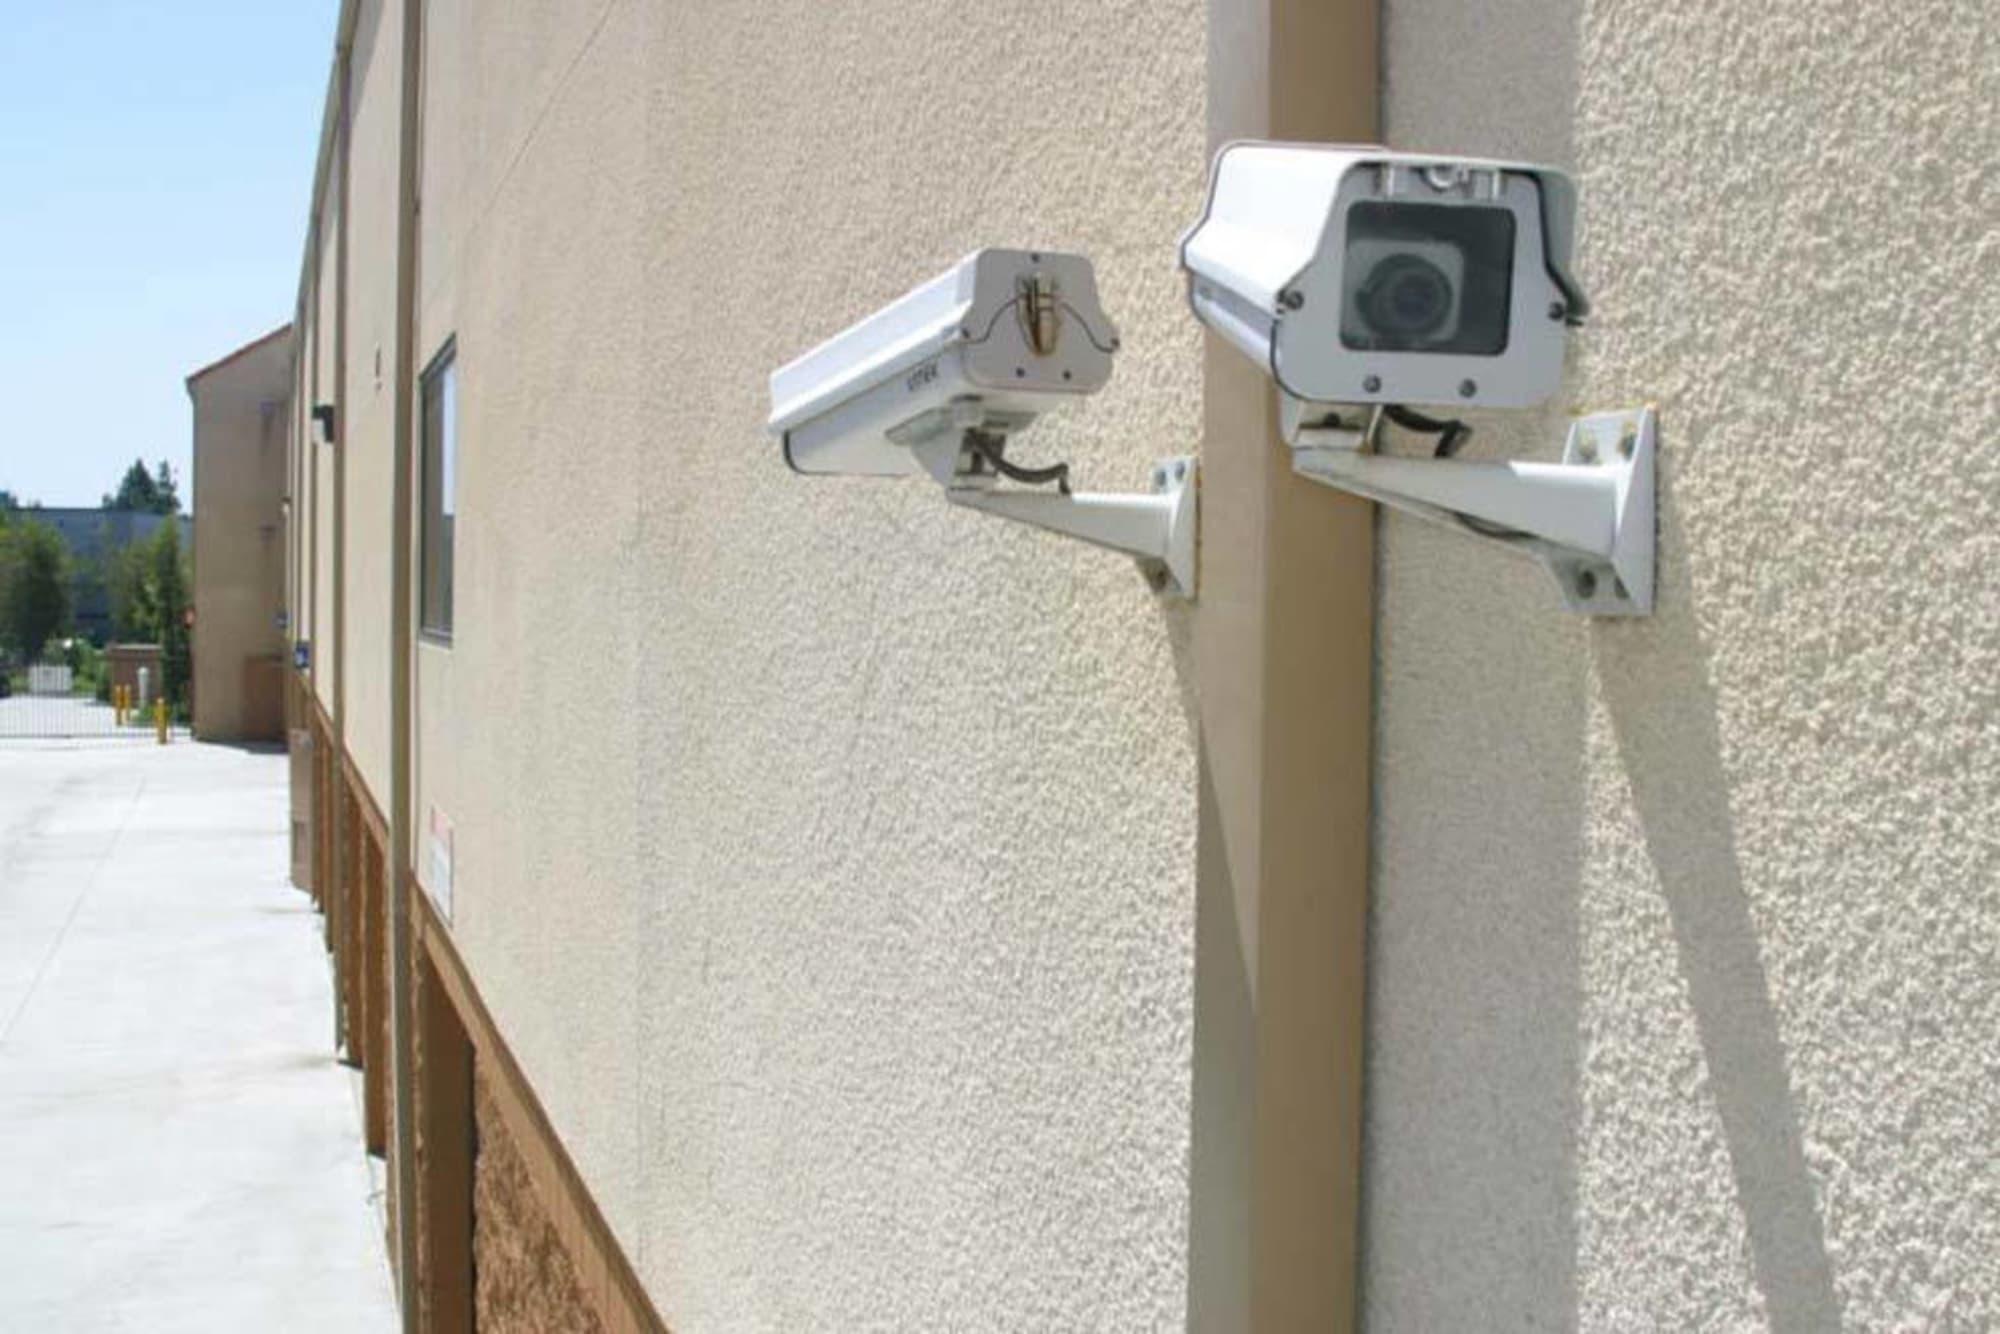 Security Cameras at A-1 Self Storage in San Diego, CA